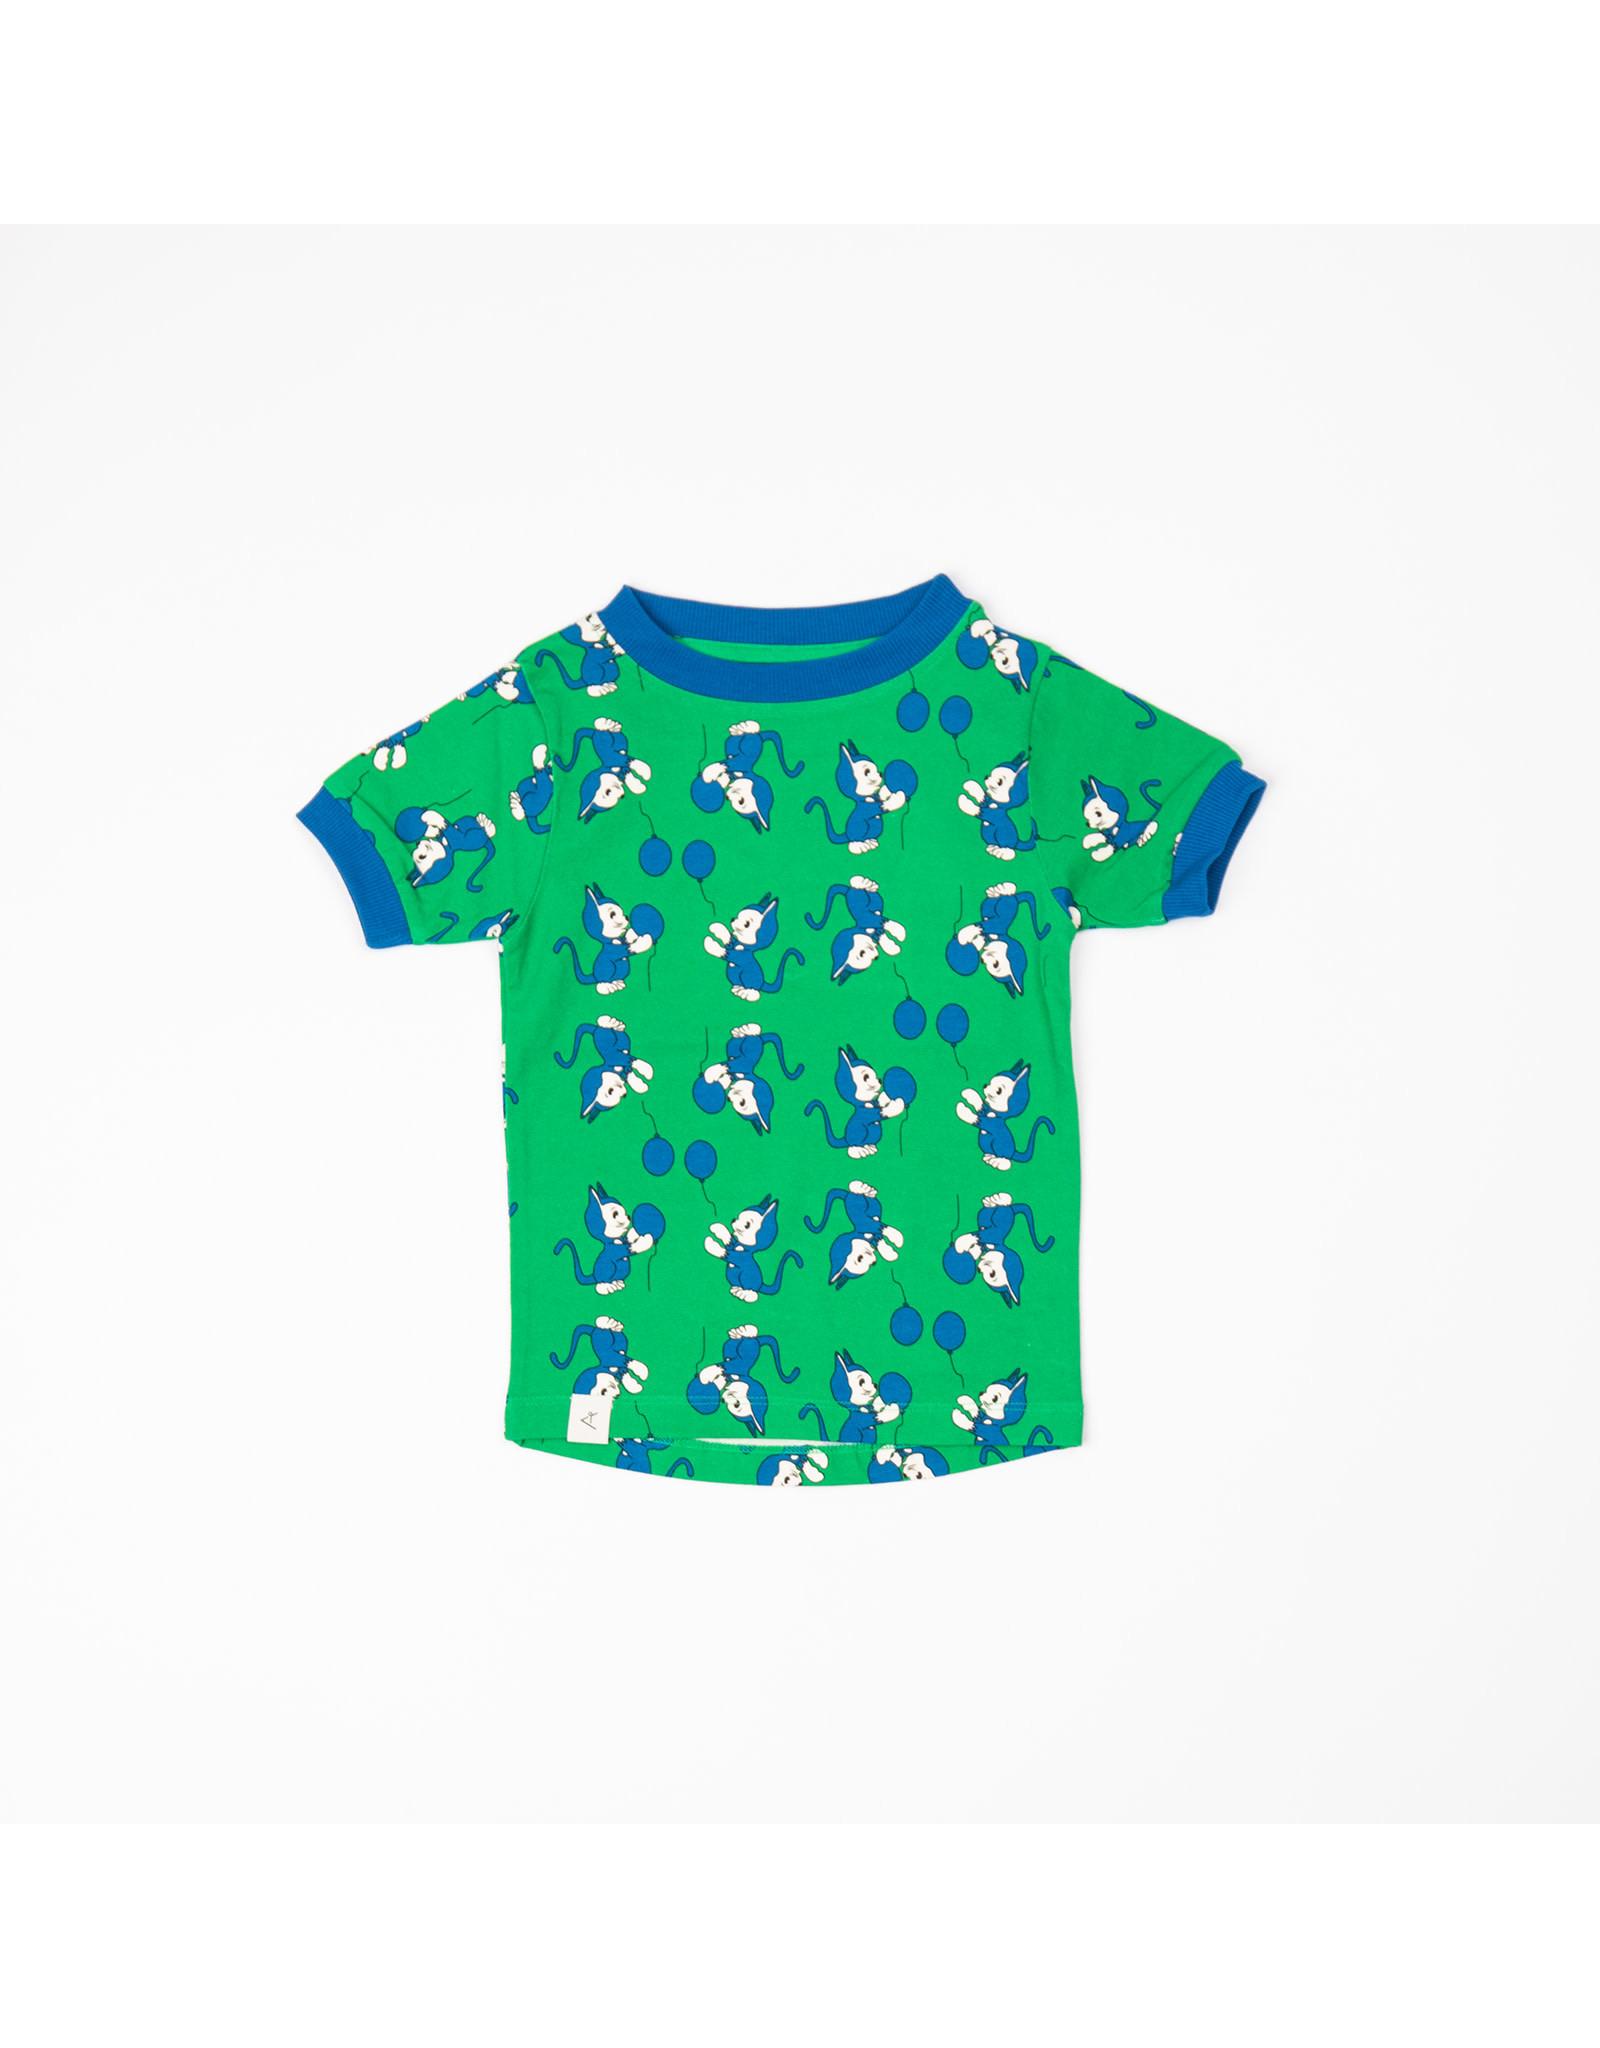 ALBA of Denmark Groene unisex t-shirt met poezenprint